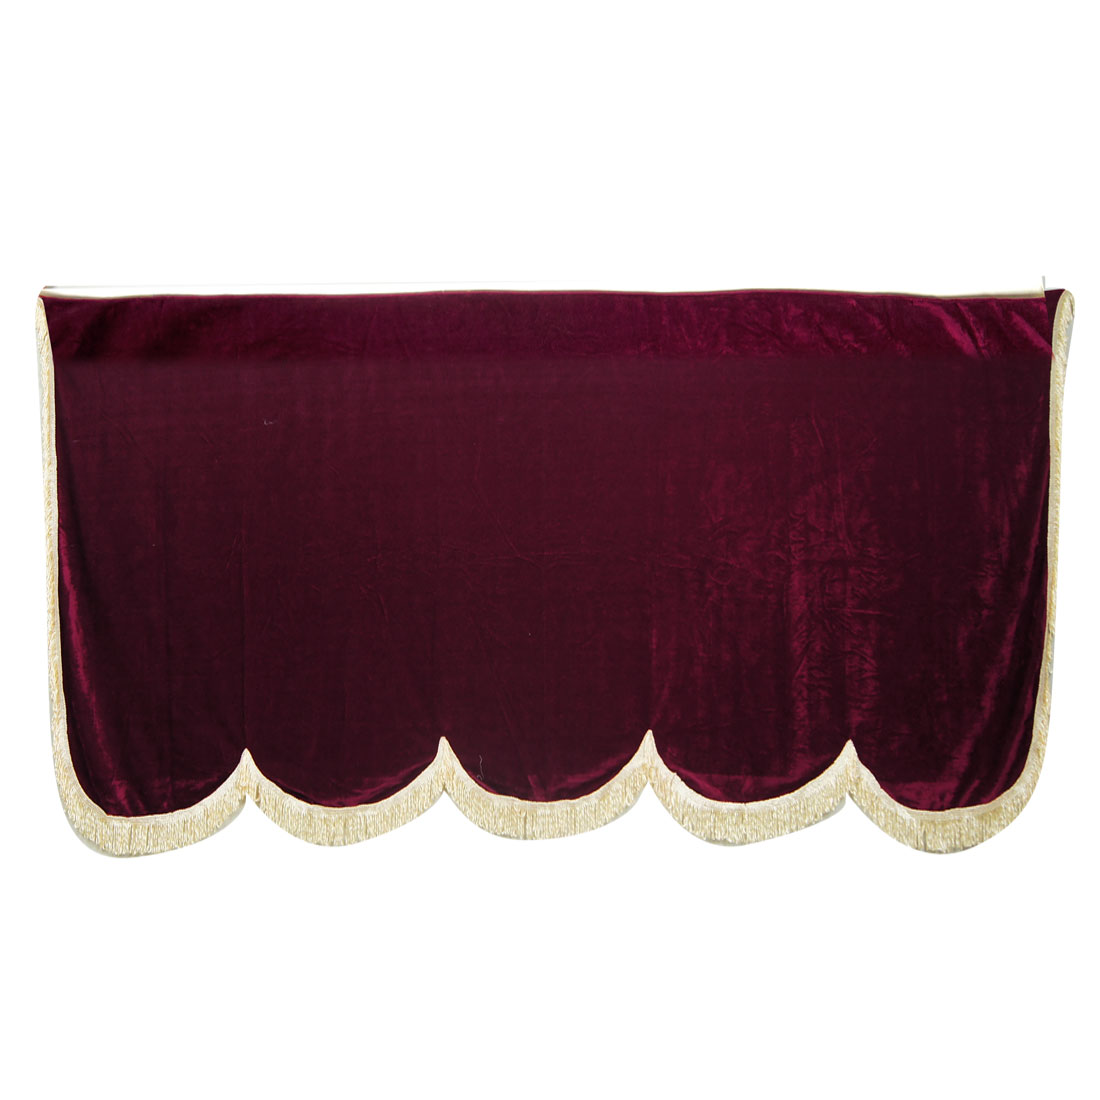 Beige Tassels Frame Burgundy Piano Protector Full Cover 146x138x17cm